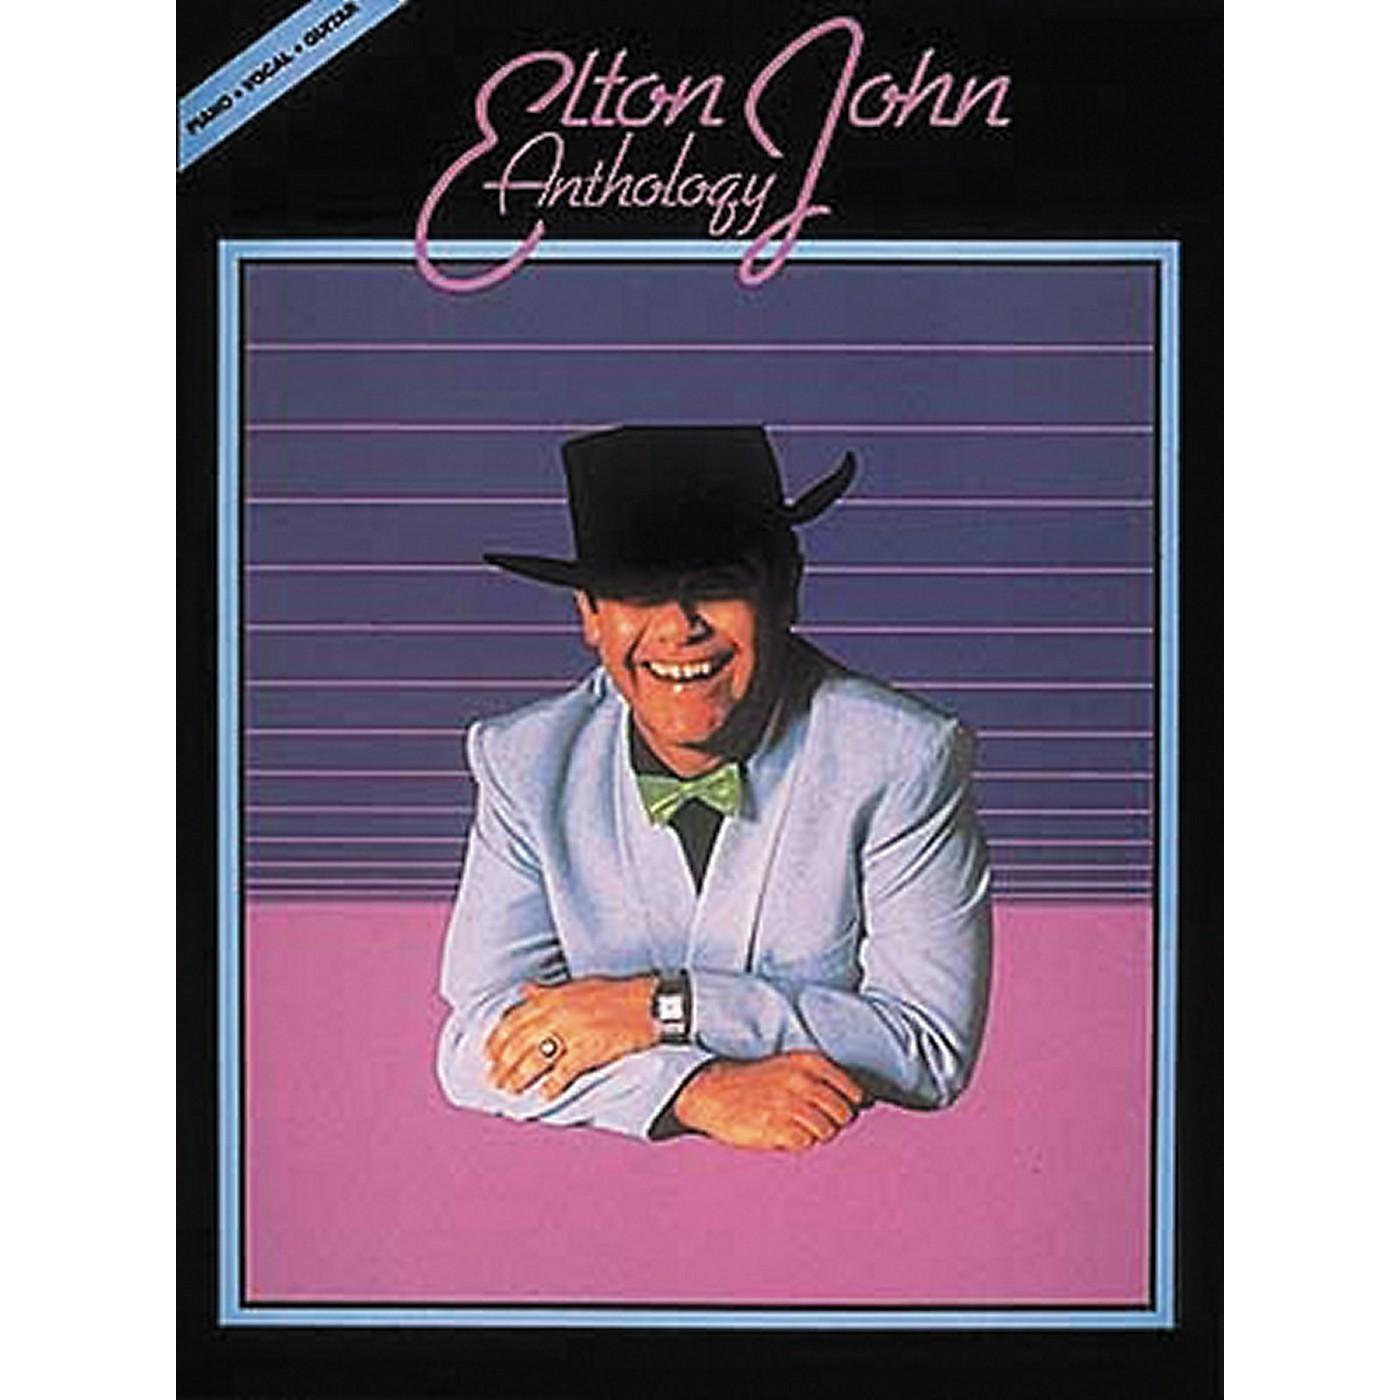 Hal Leonard Elton John Anthology Revised Piano, Vocal, Guitar Songbook thumbnail